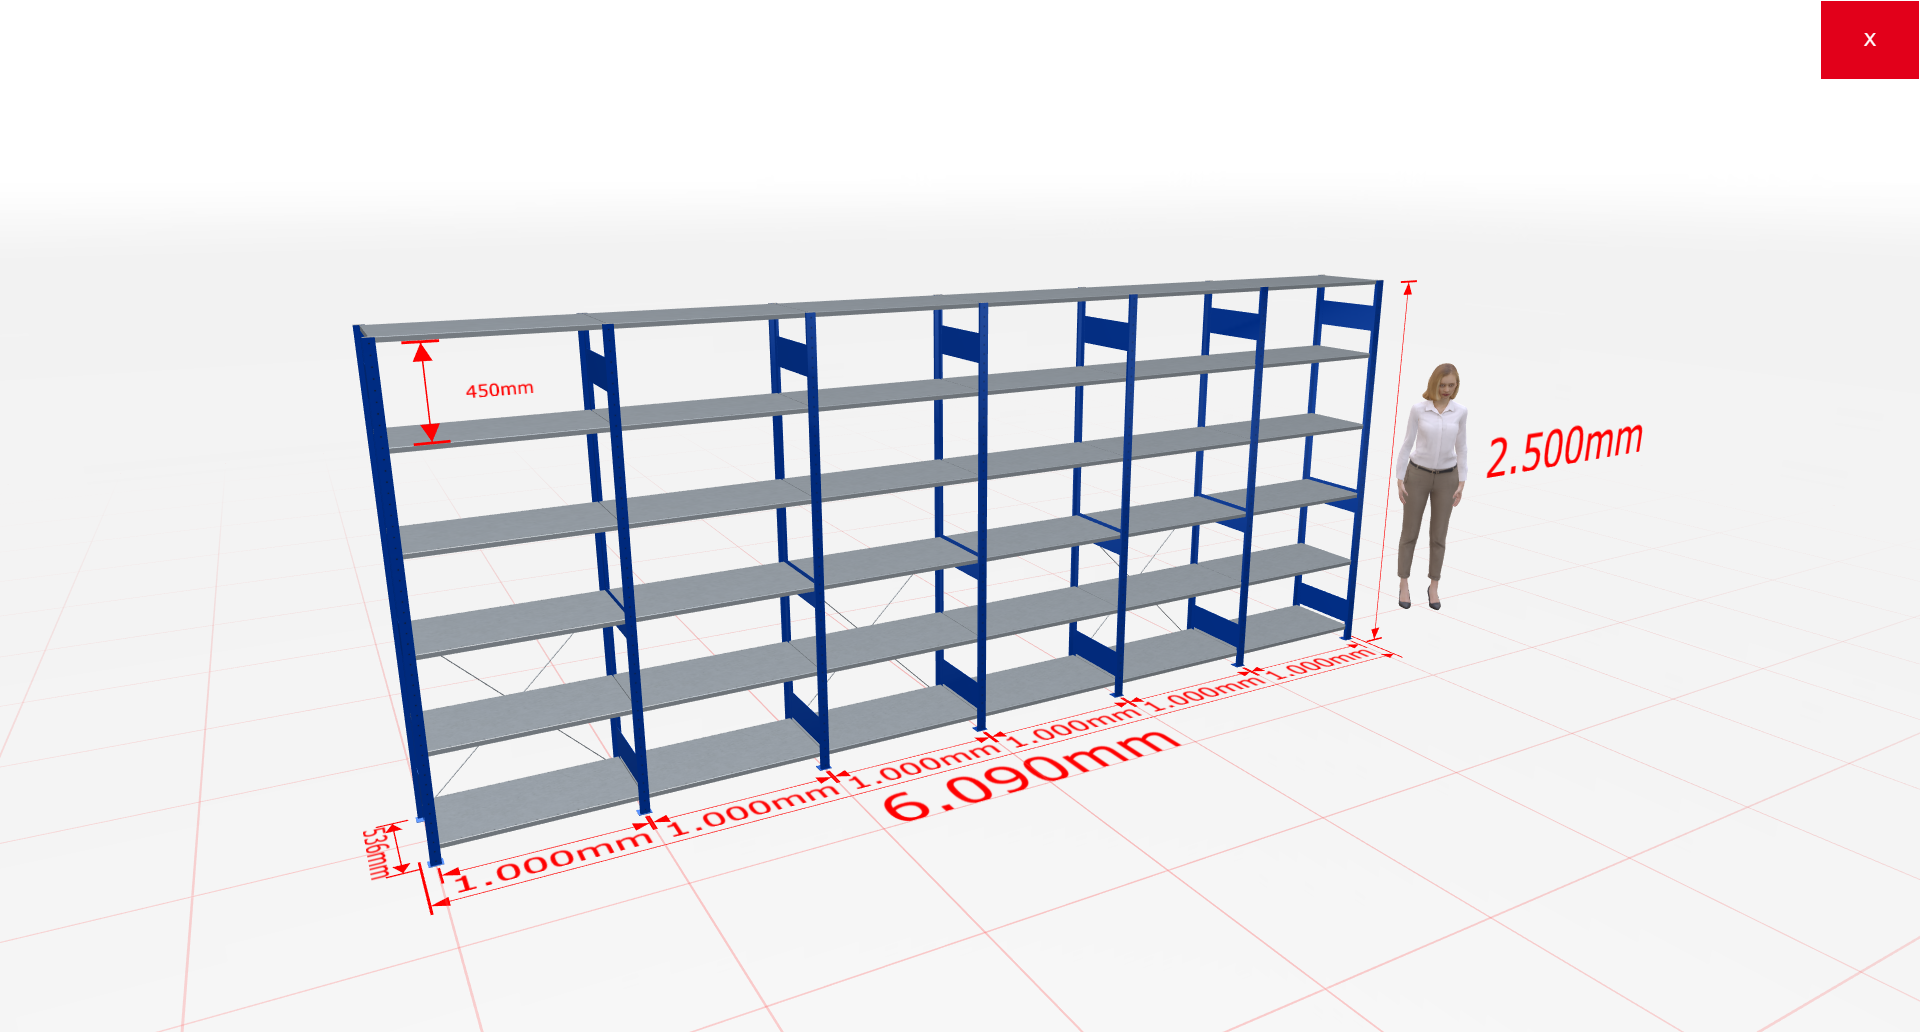 Fachbodenregal Komplettregal 2500x6090x500 mm (HxBxT) SCHULTE Lagertechnik blau 6 Ebenen  150 kg je Boden